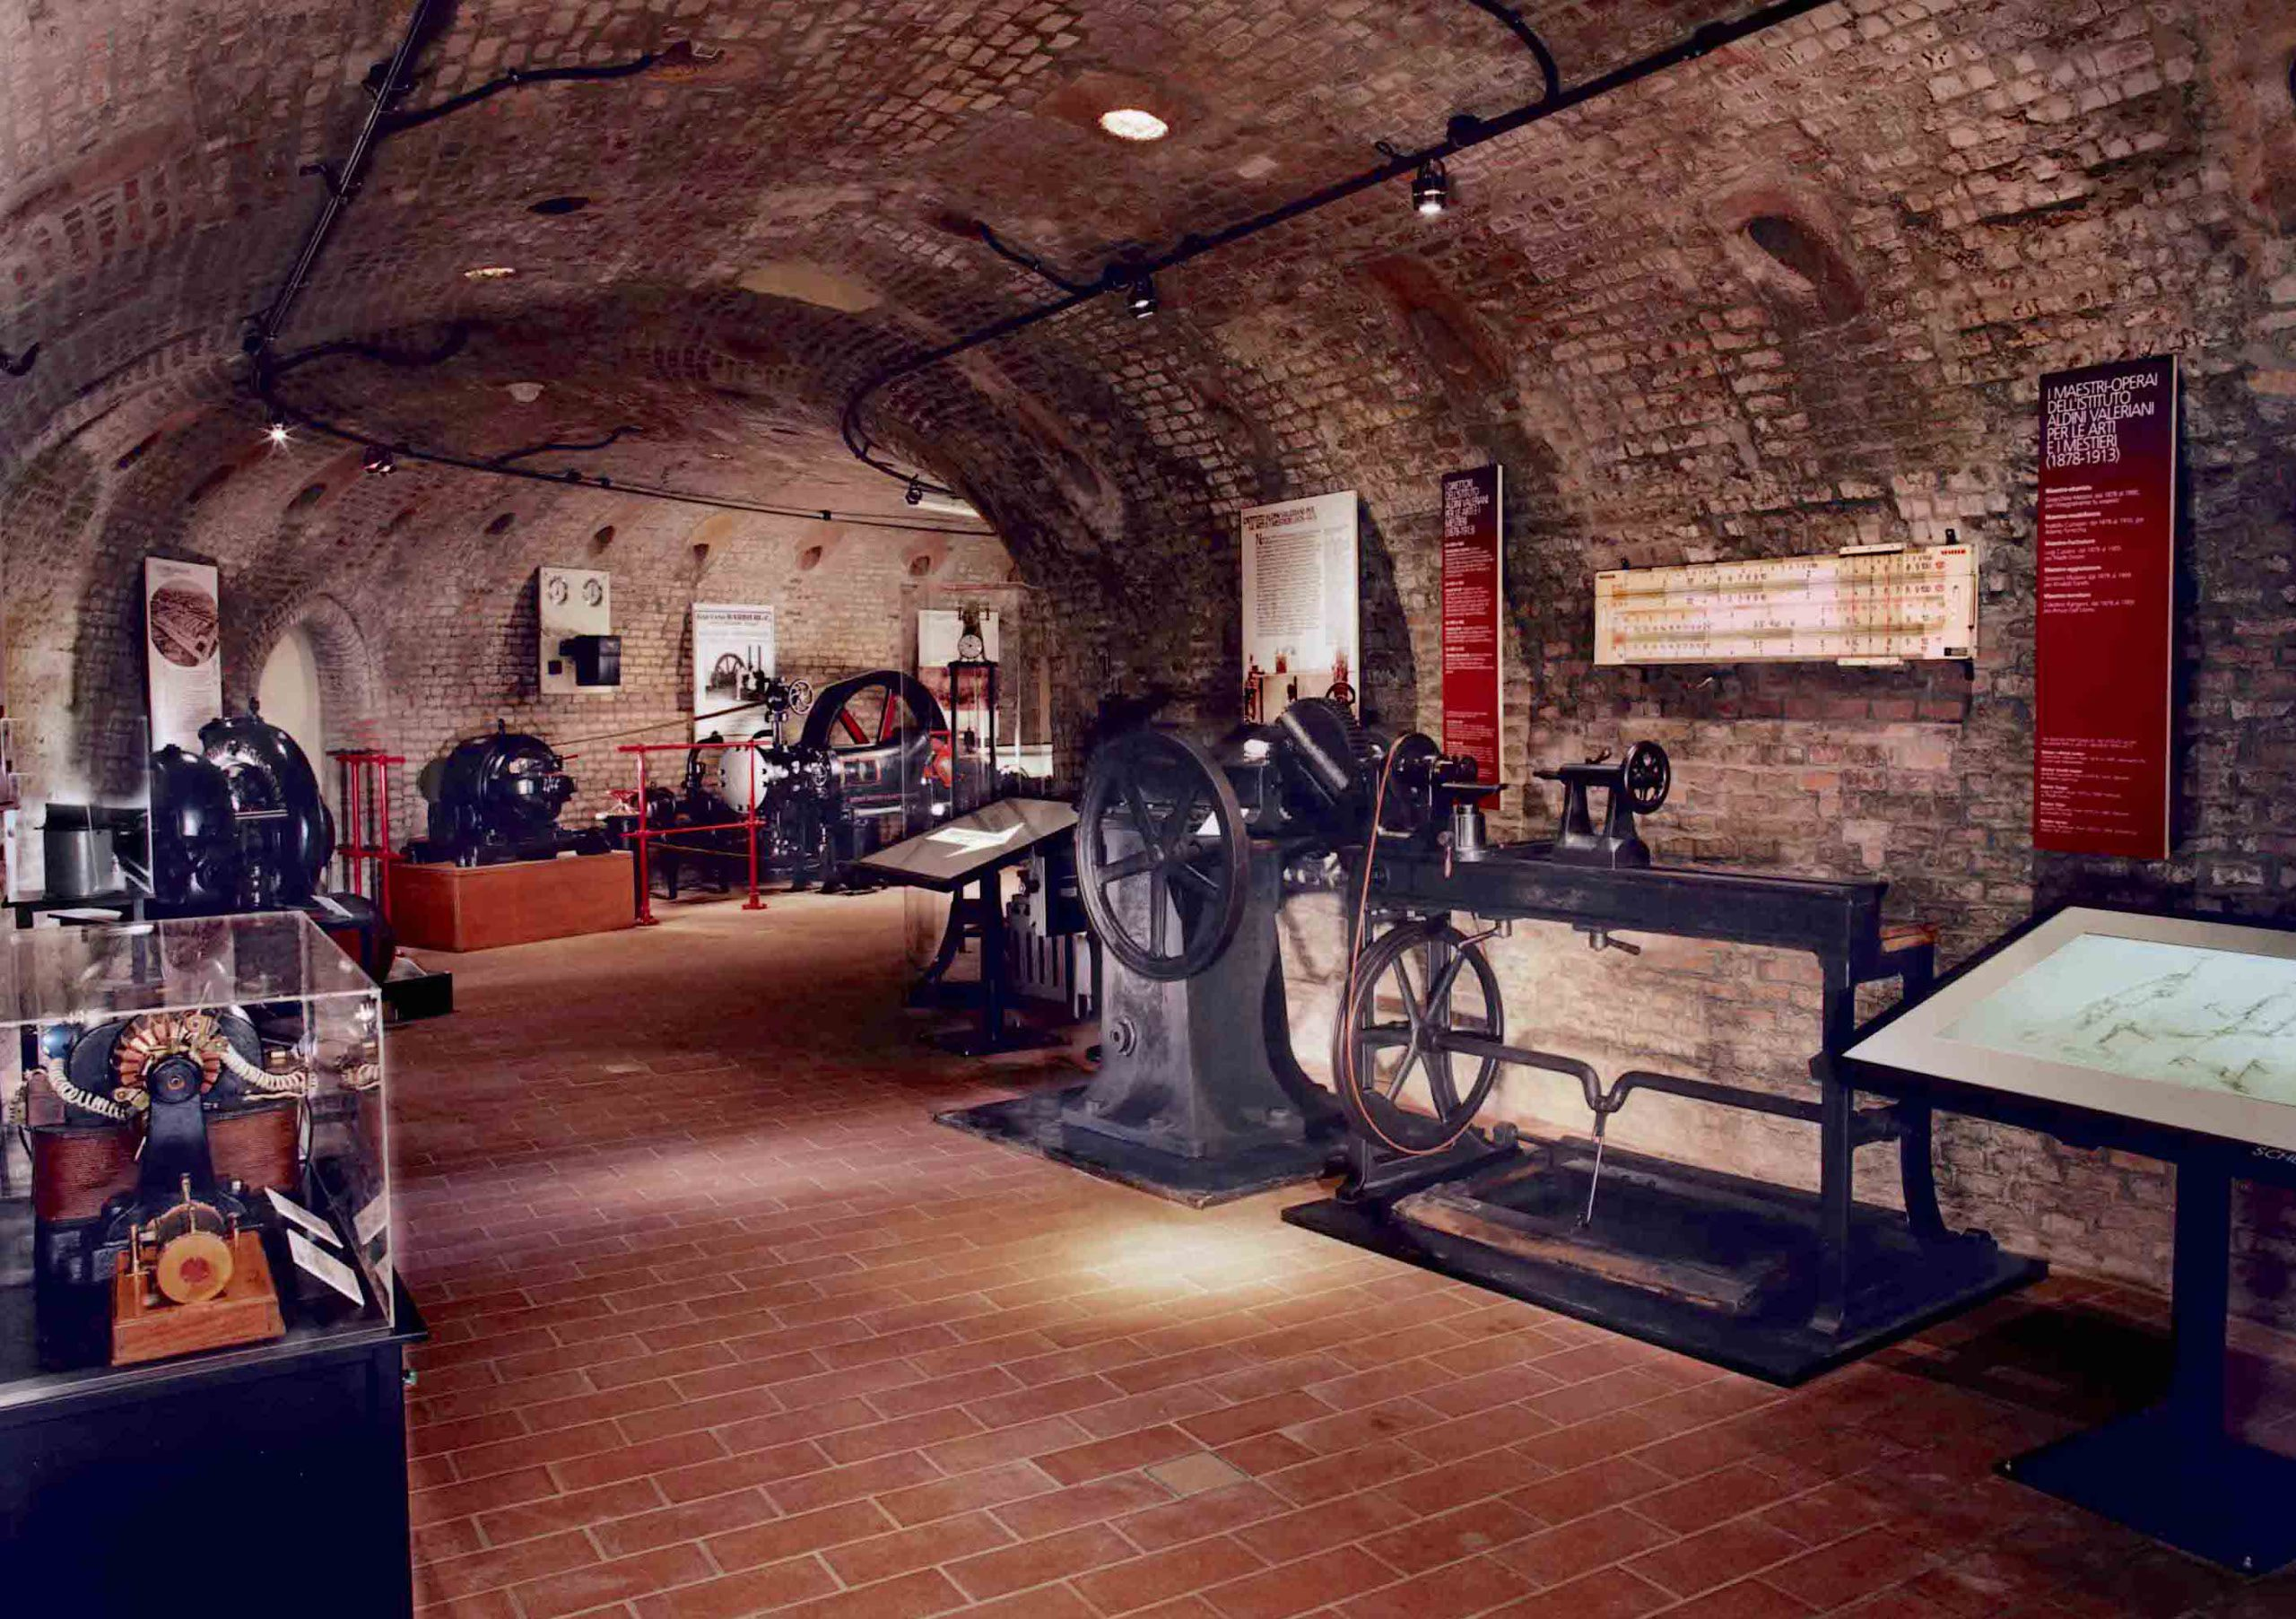 Museum of Industrial Heritage